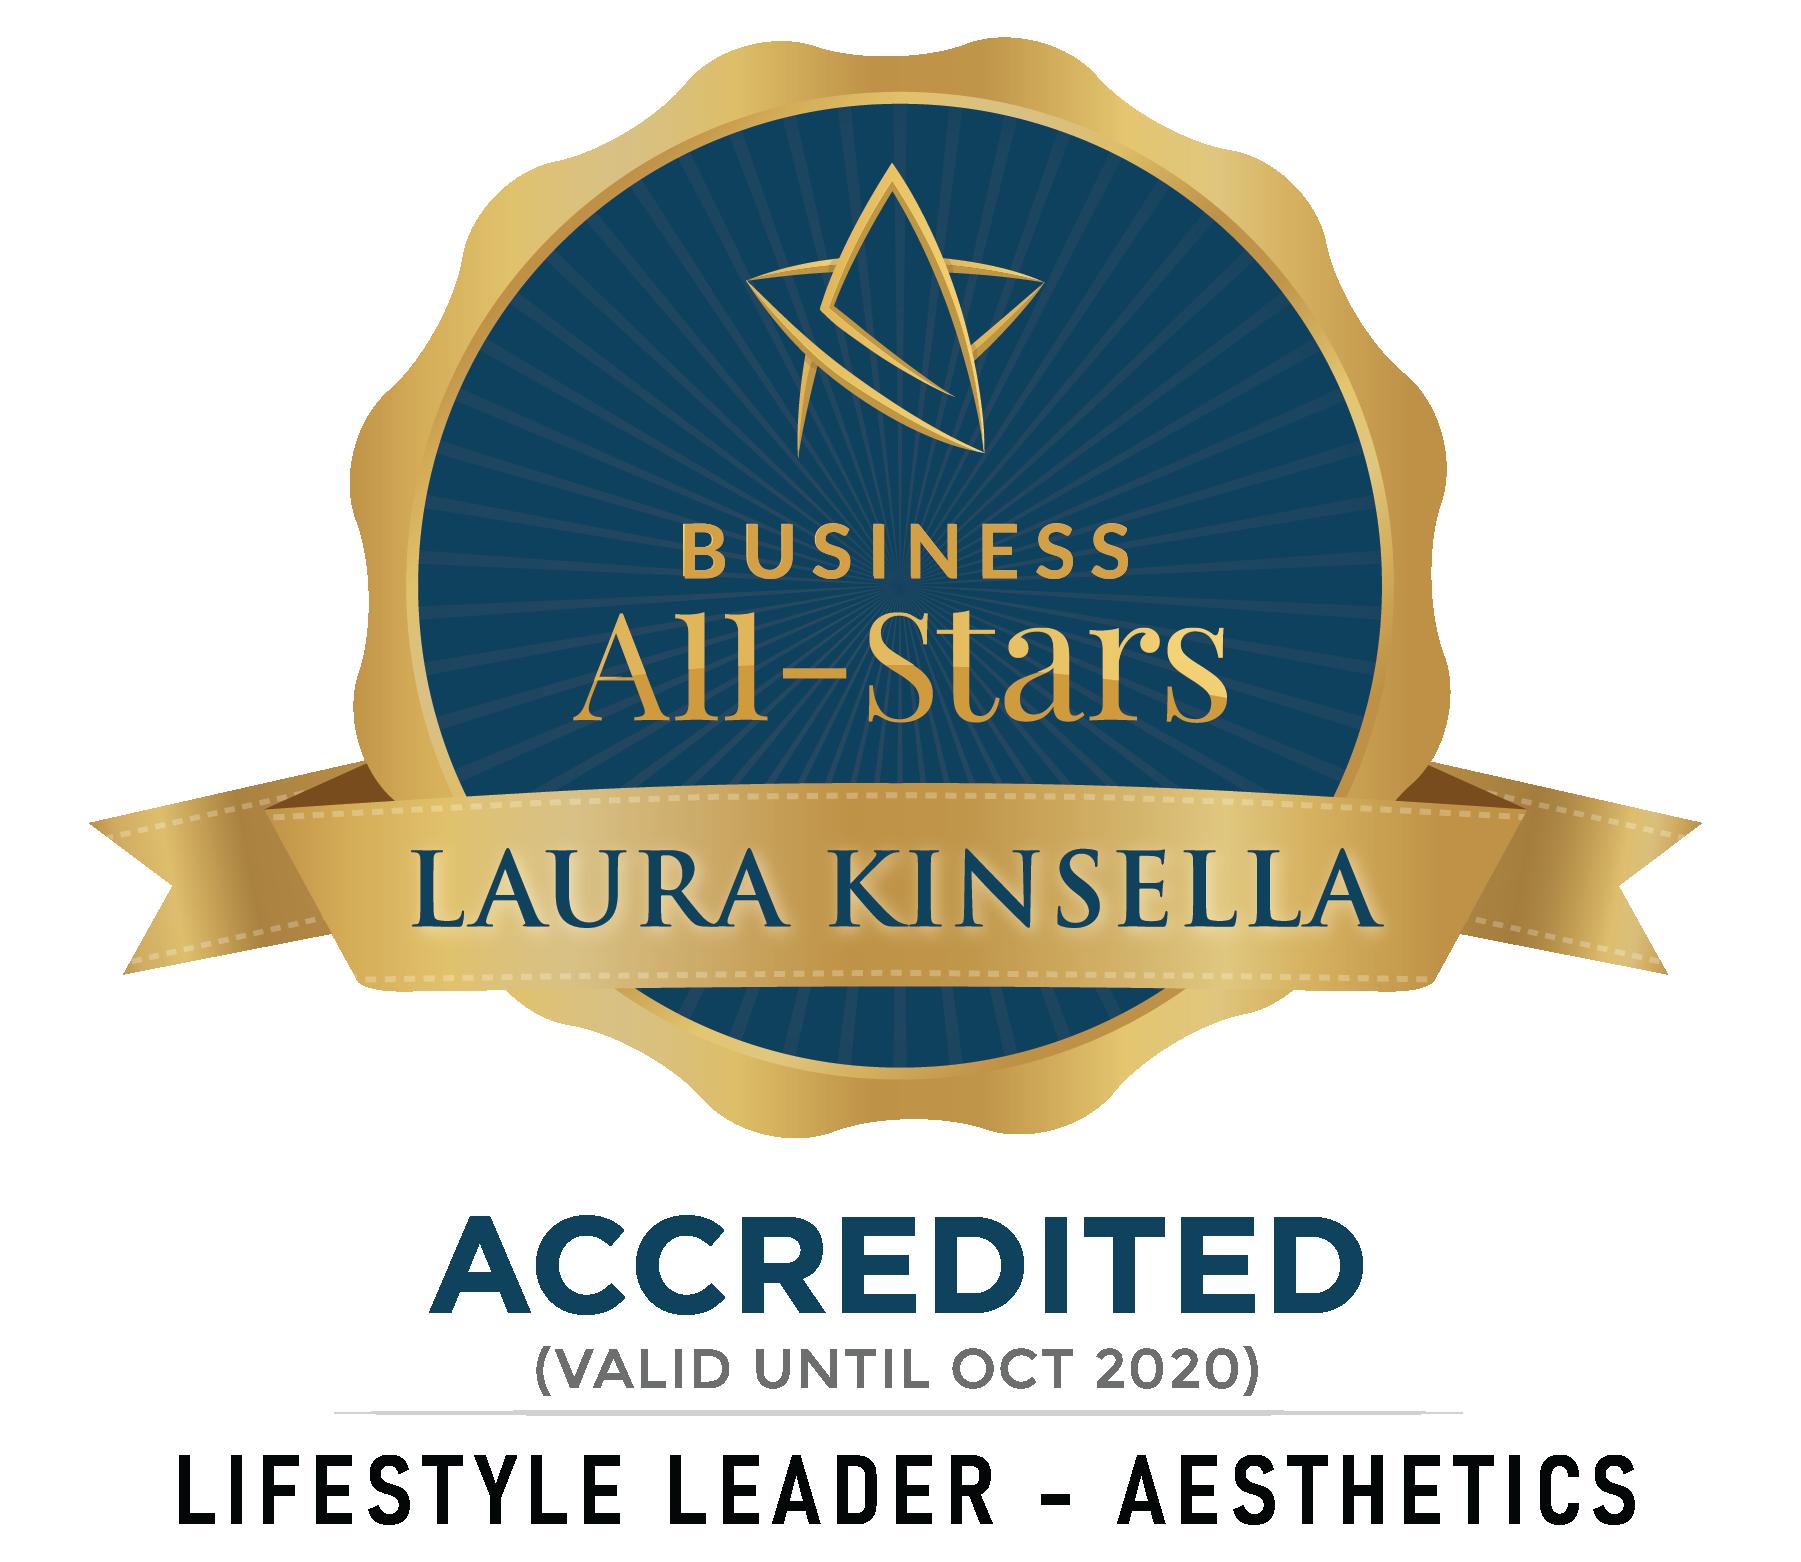 Laura Kinsella - LMK Skin - Business All-Stars Accreditation